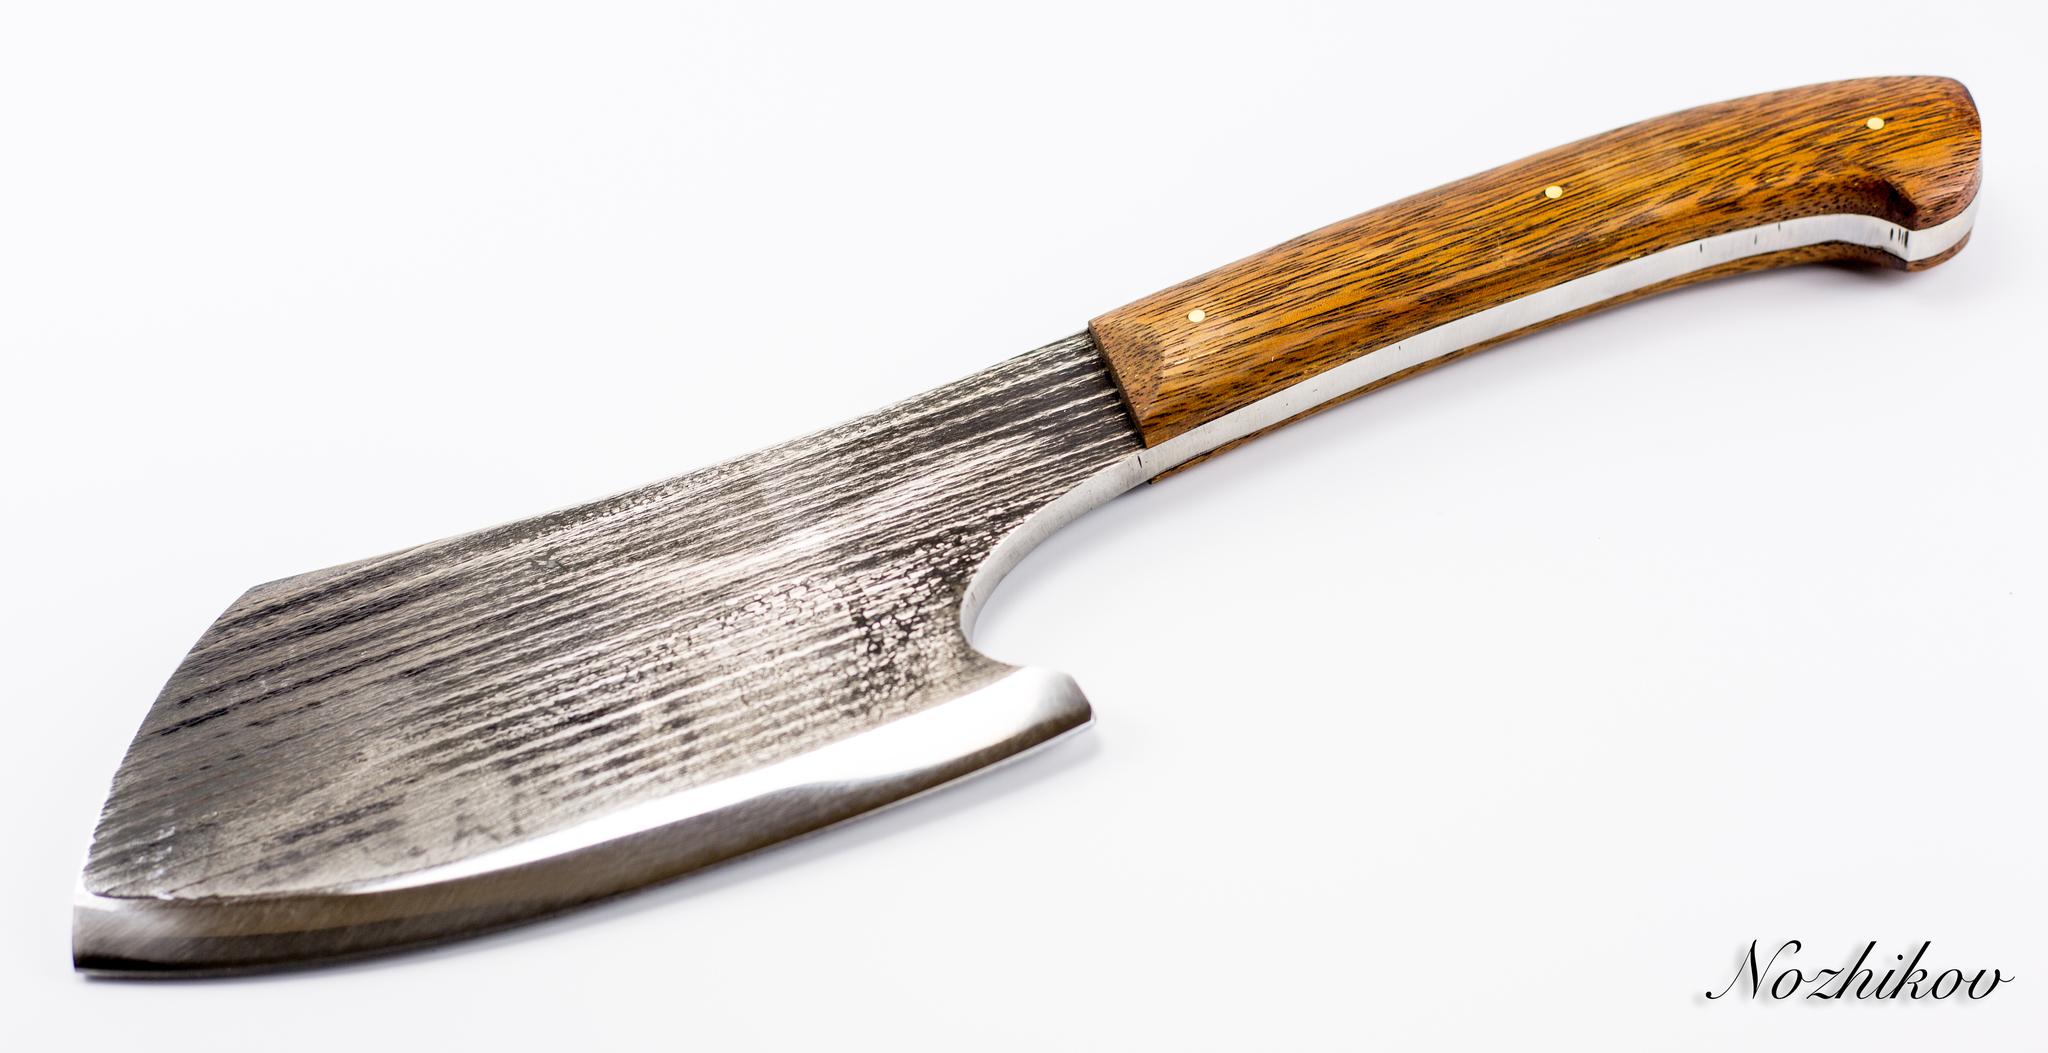 Фото 2 - Тяпка для мяса №7, сталь У8 от Промтехснаб